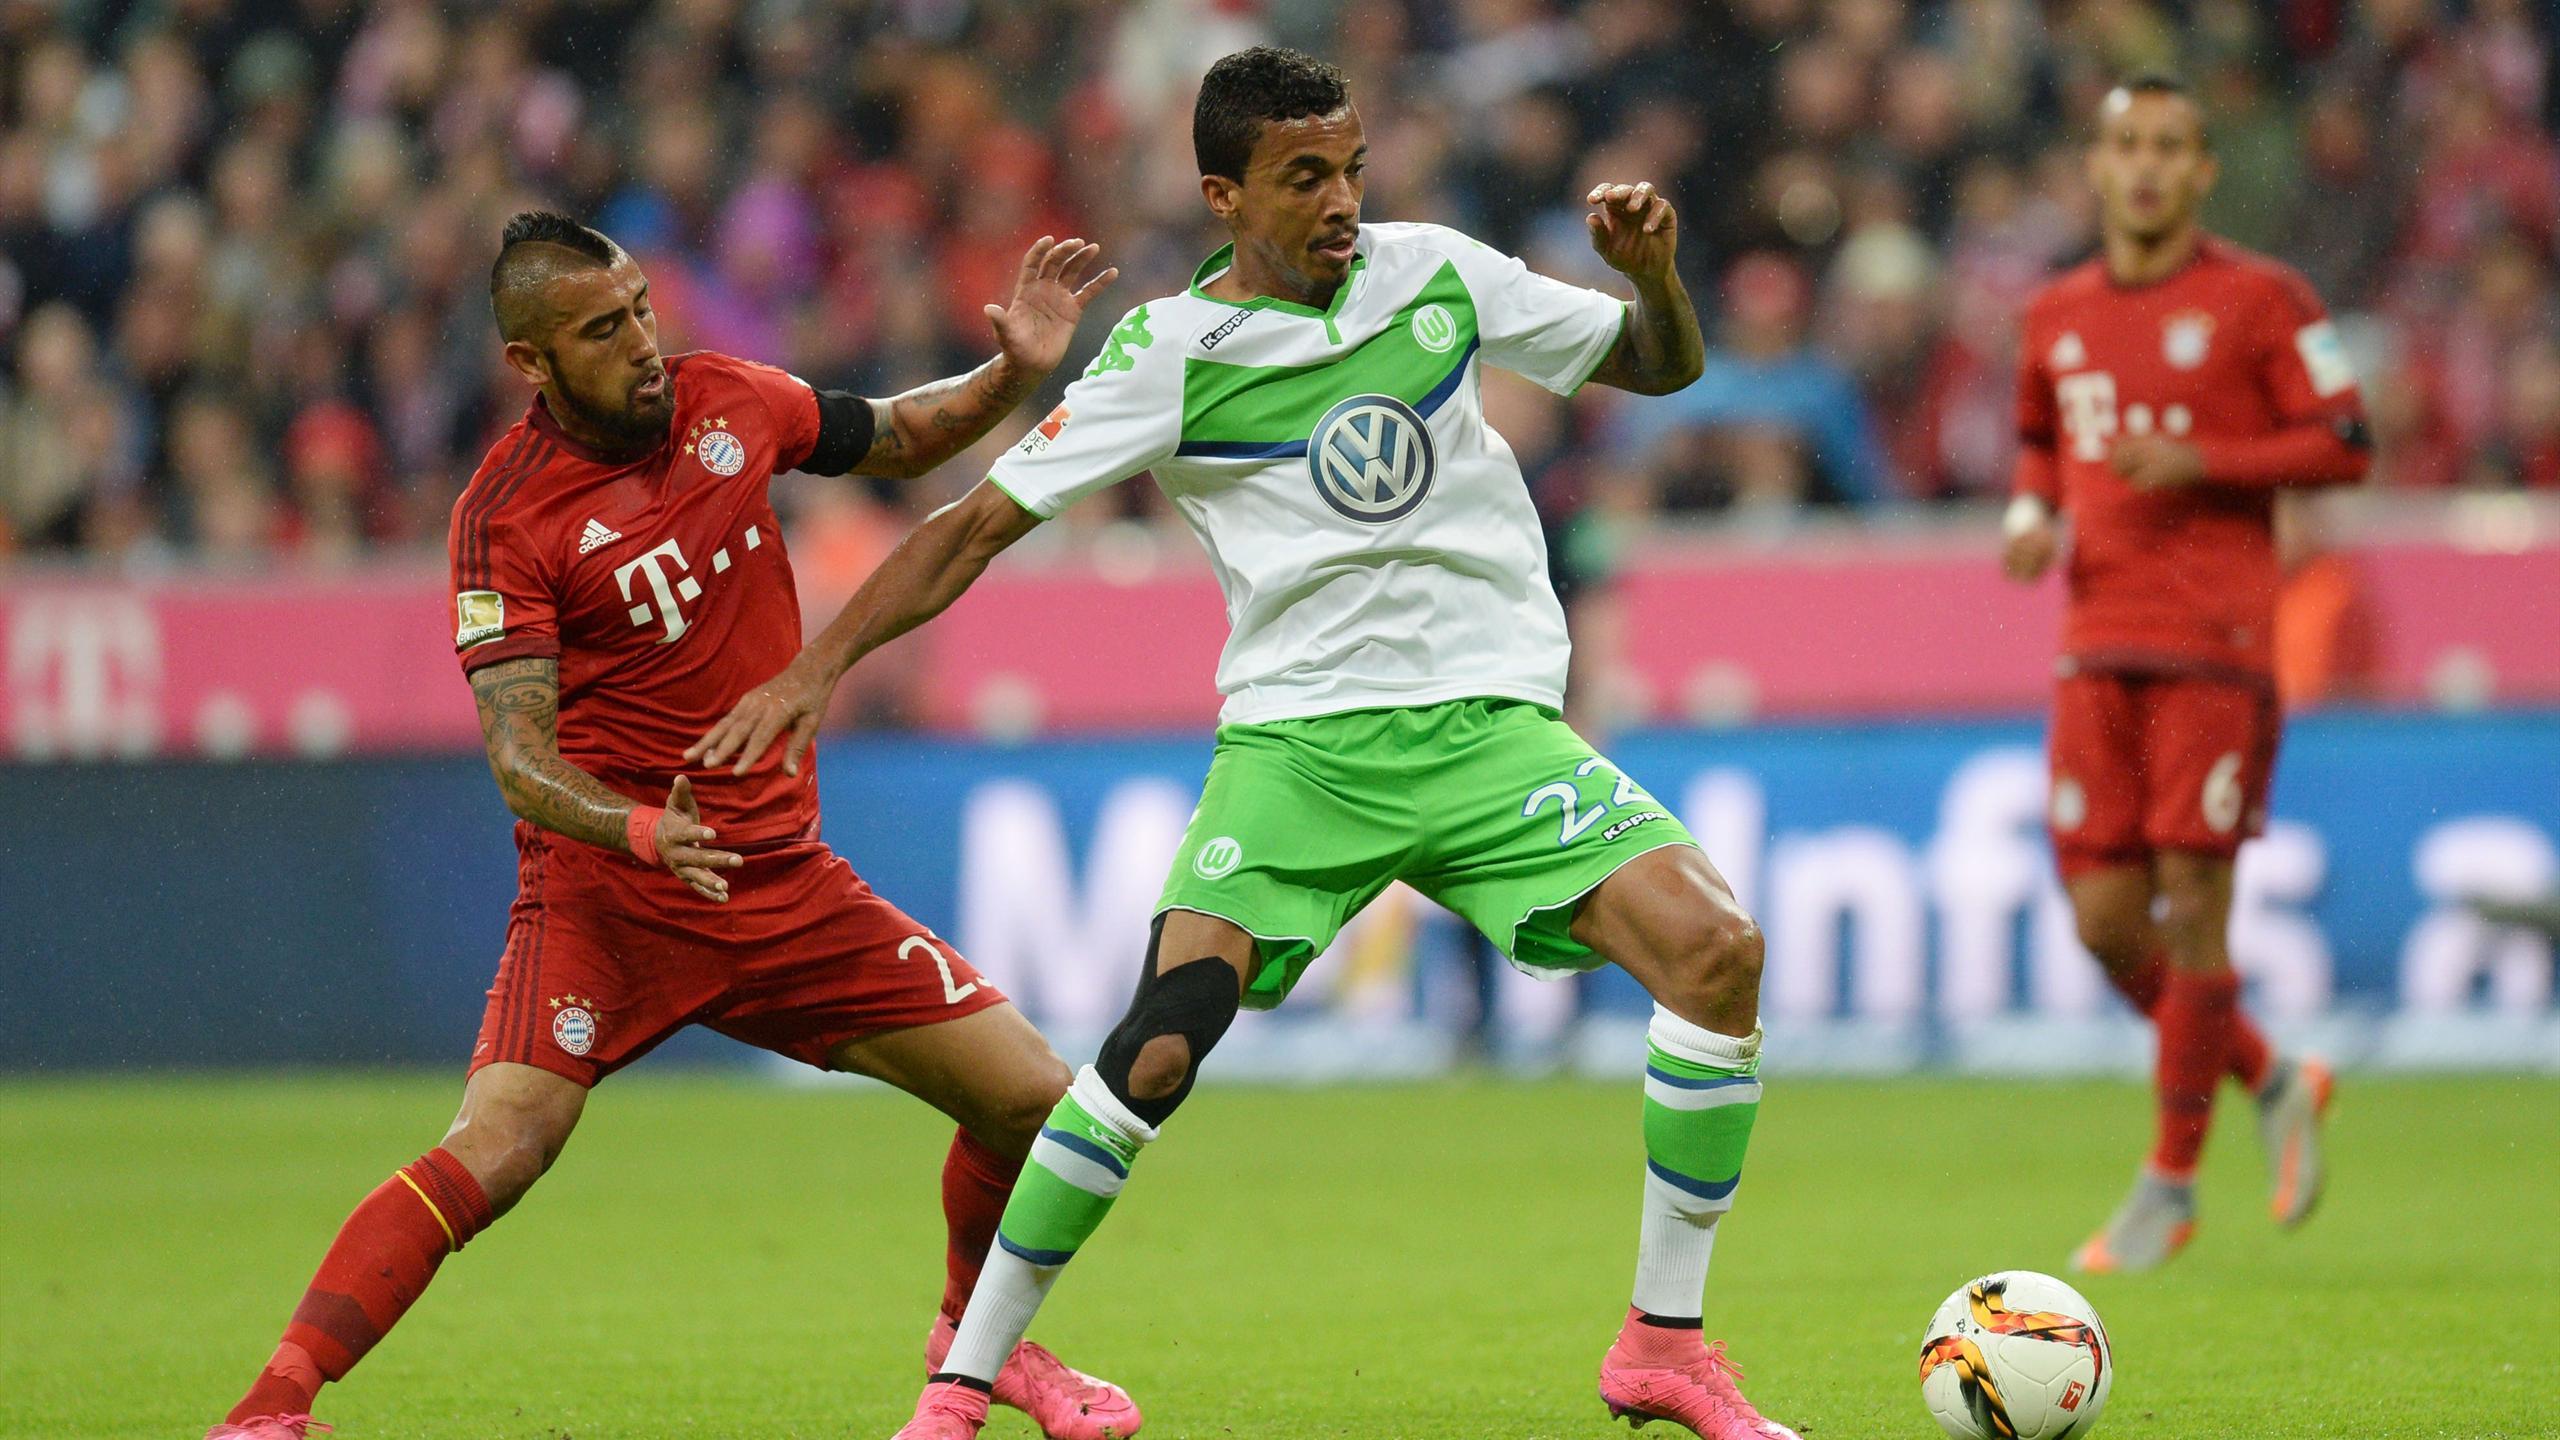 Arturo Vidal et Luiz Gustavo lors de Bayern-Wolfsburg